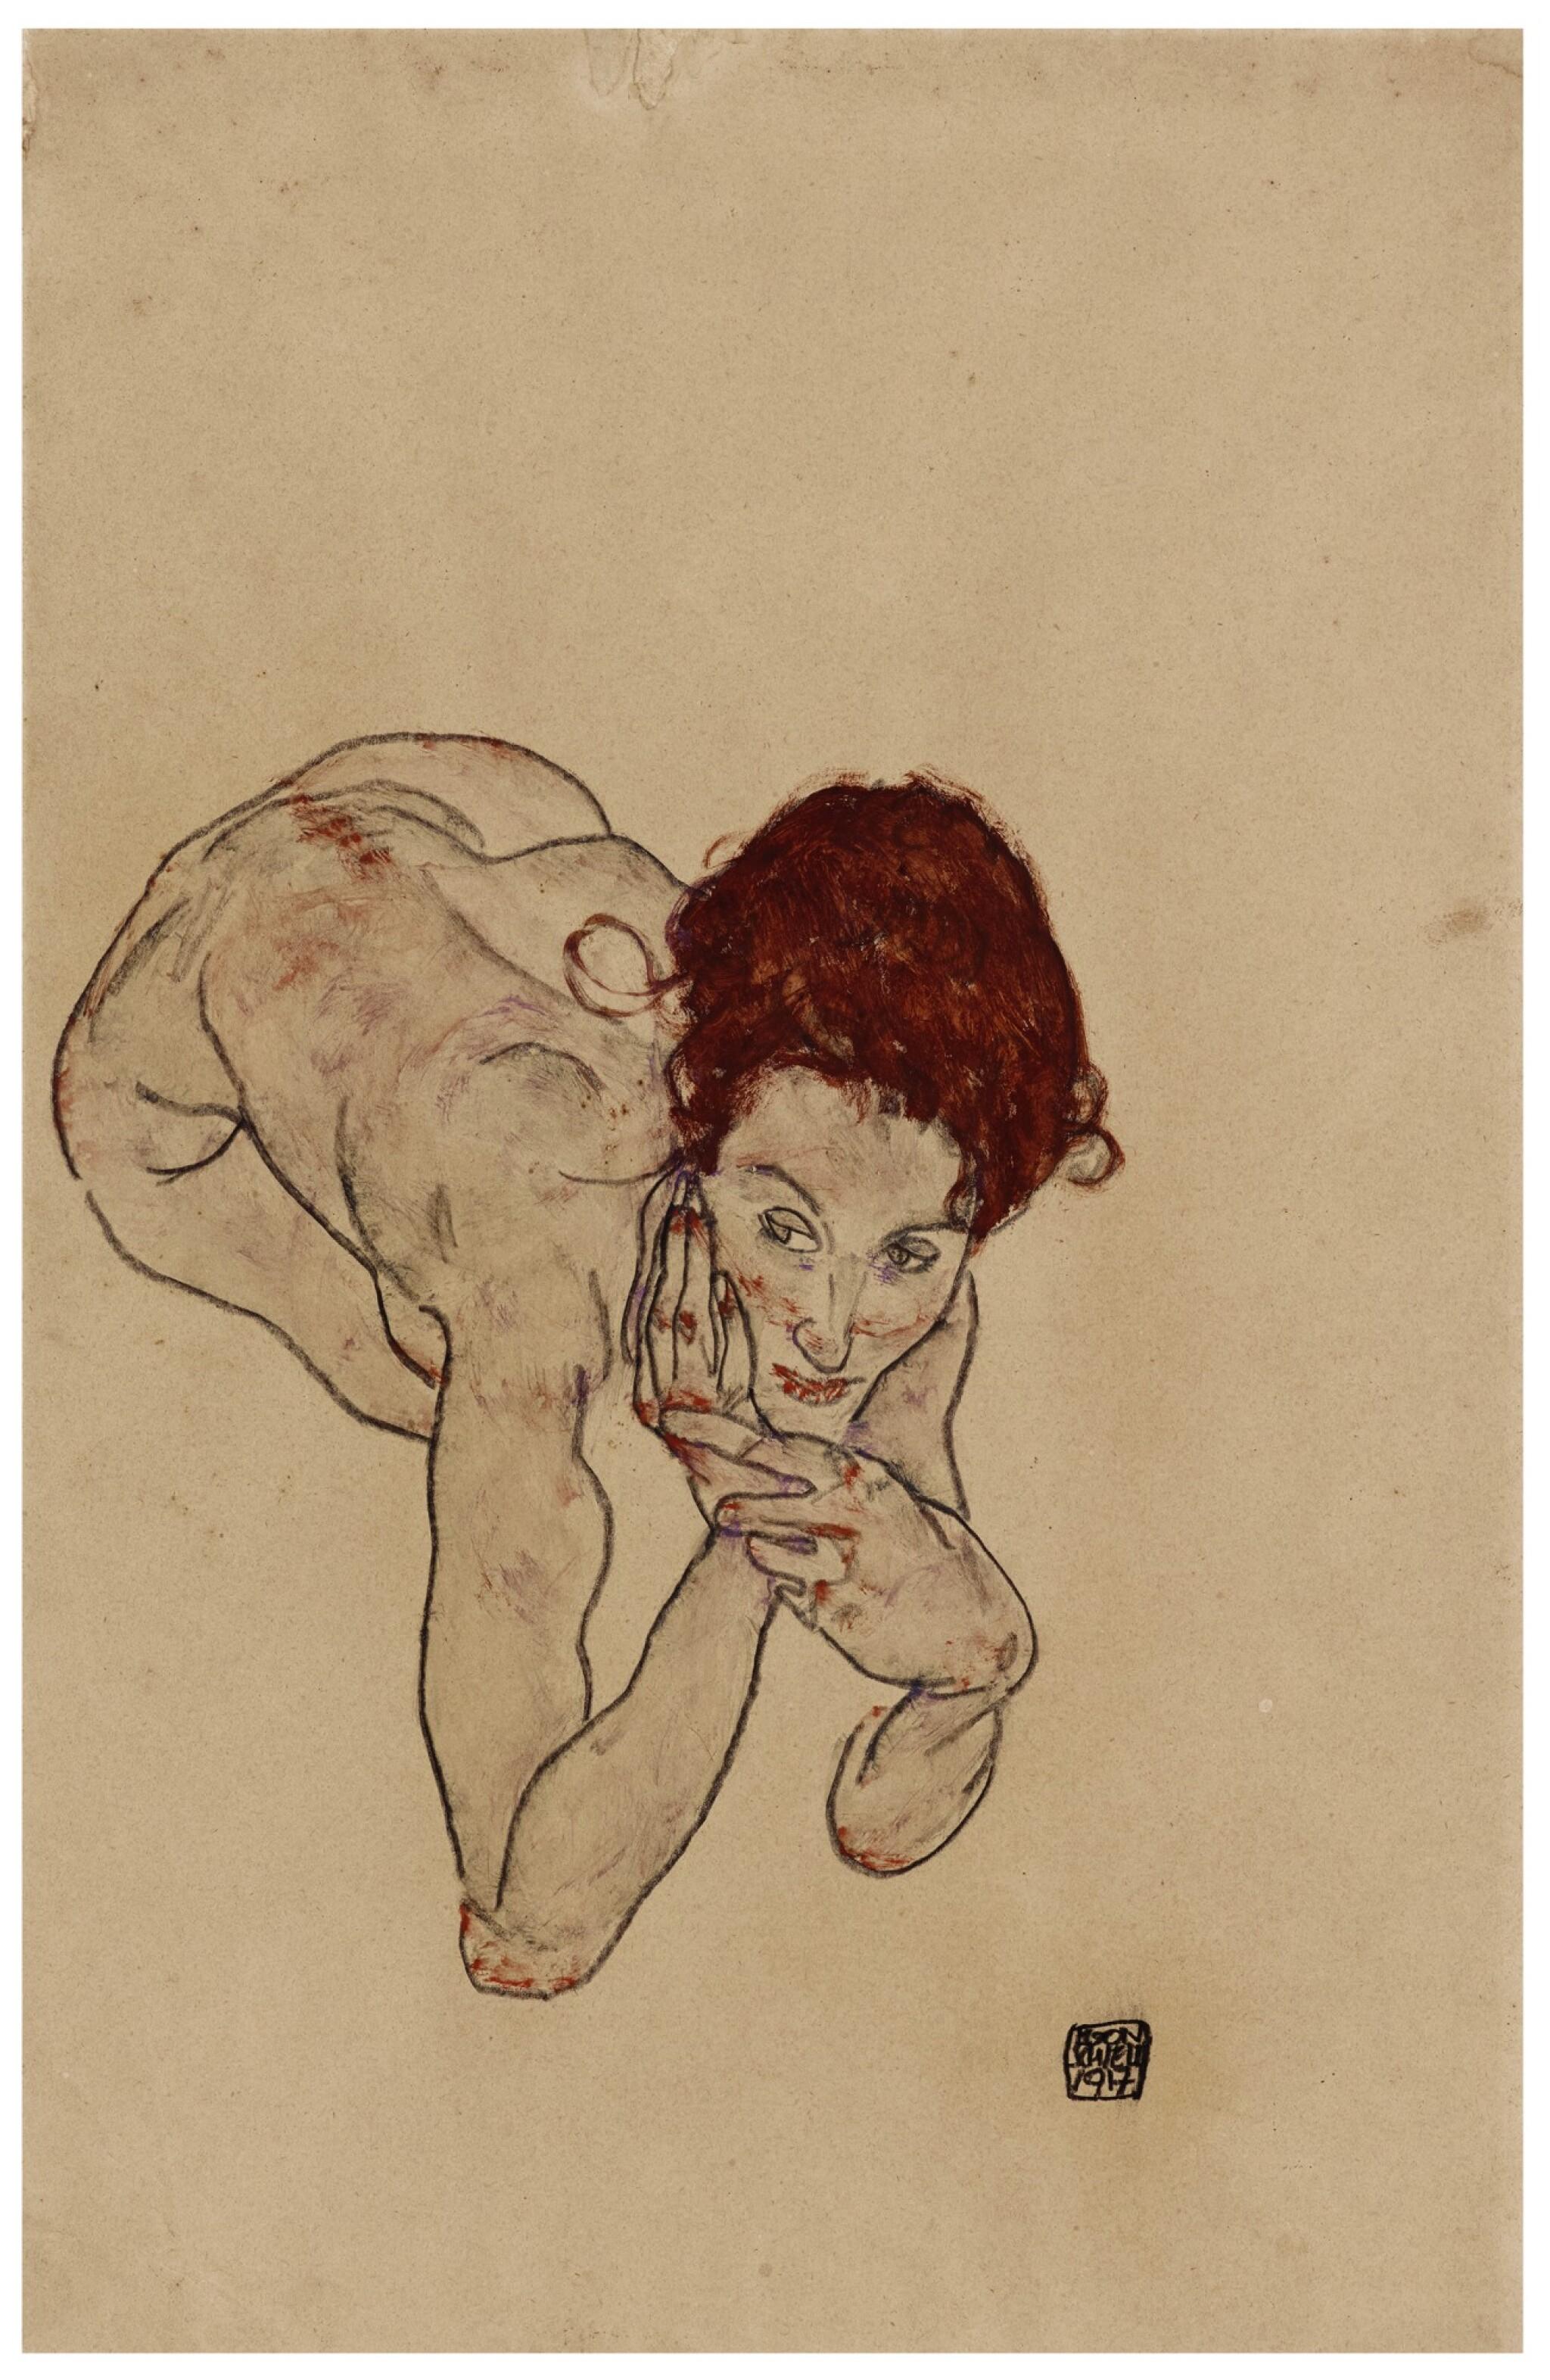 View full screen - View 1 of Lot 1018. Kauernder weiblicher Akt (Crouching Female Nude).